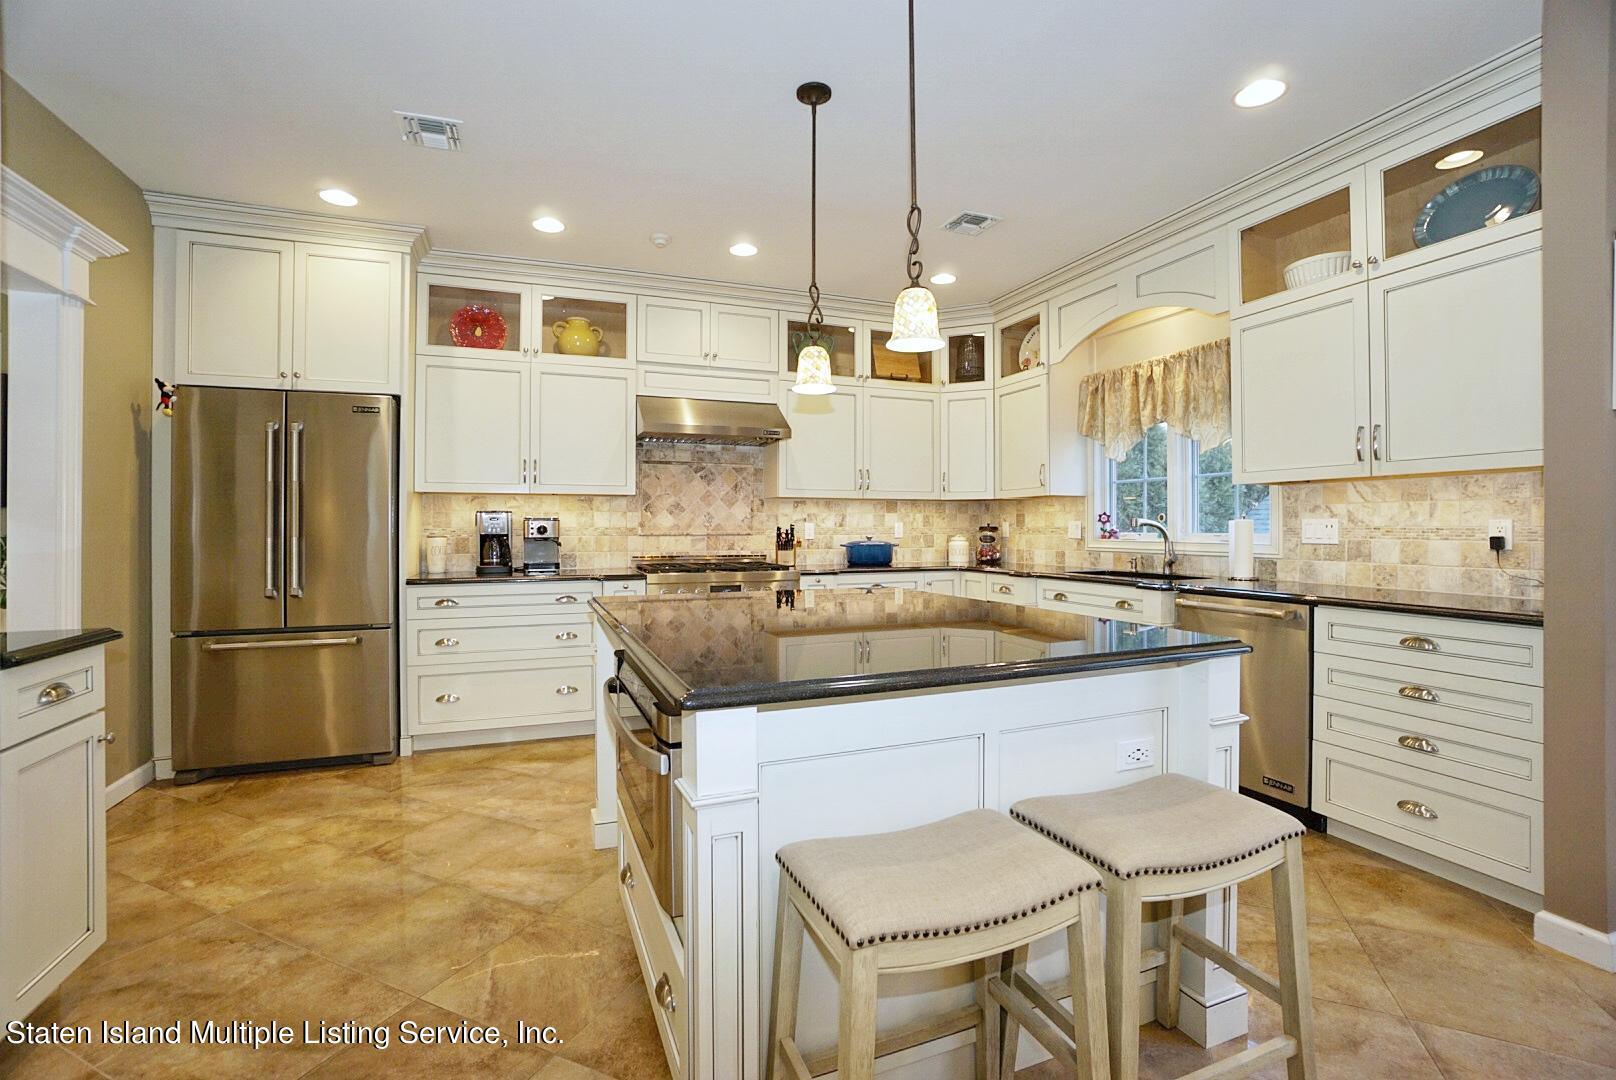 Single Family - Detached 31 Belwood Loop  Staten Island, NY 10307, MLS-1143133-21